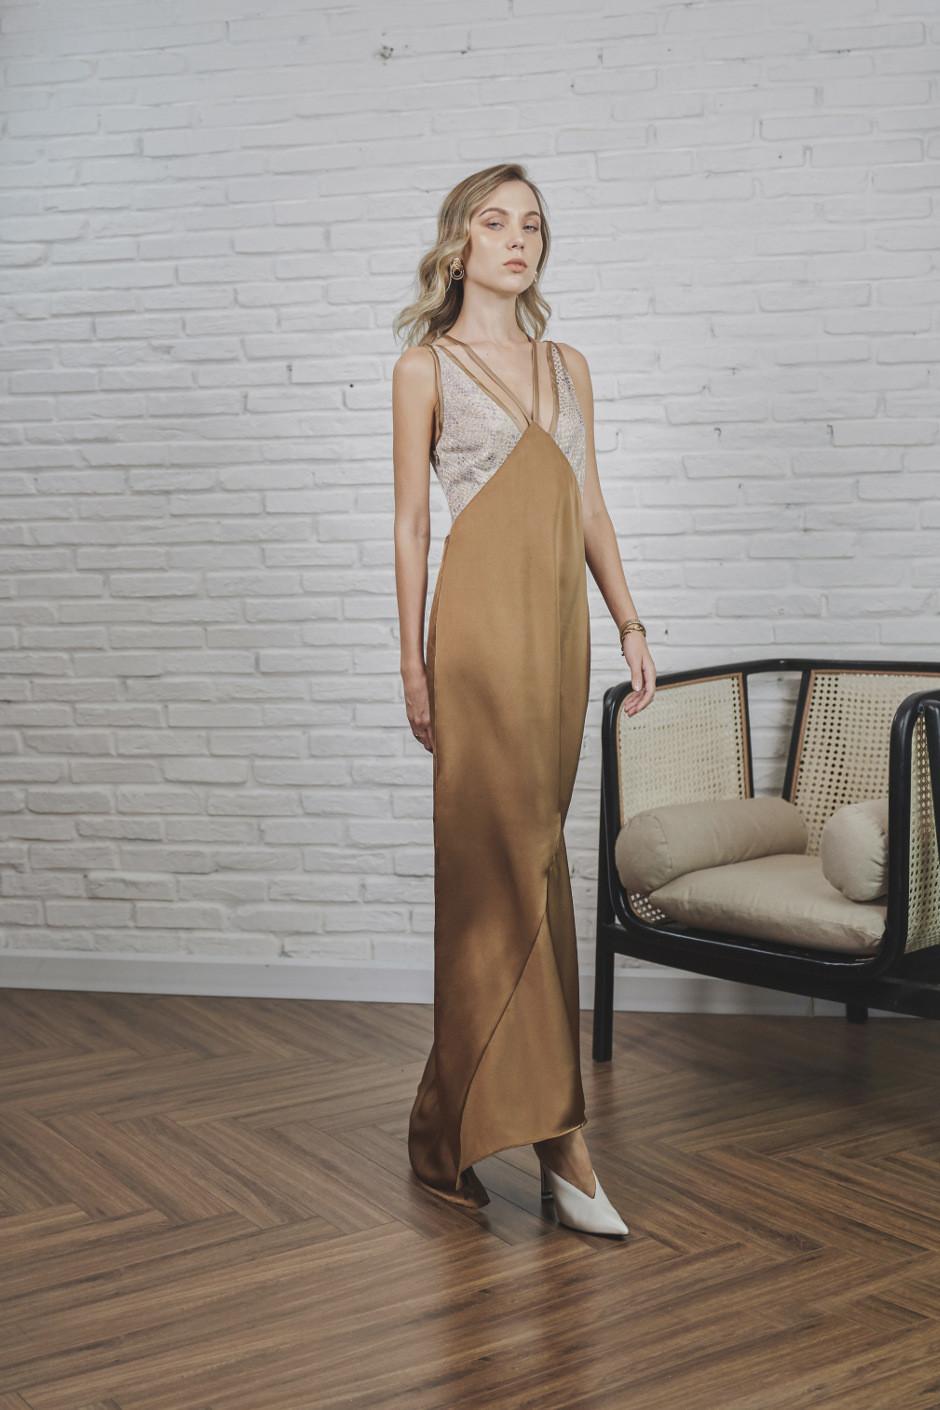 Golden Brown Angie Dress